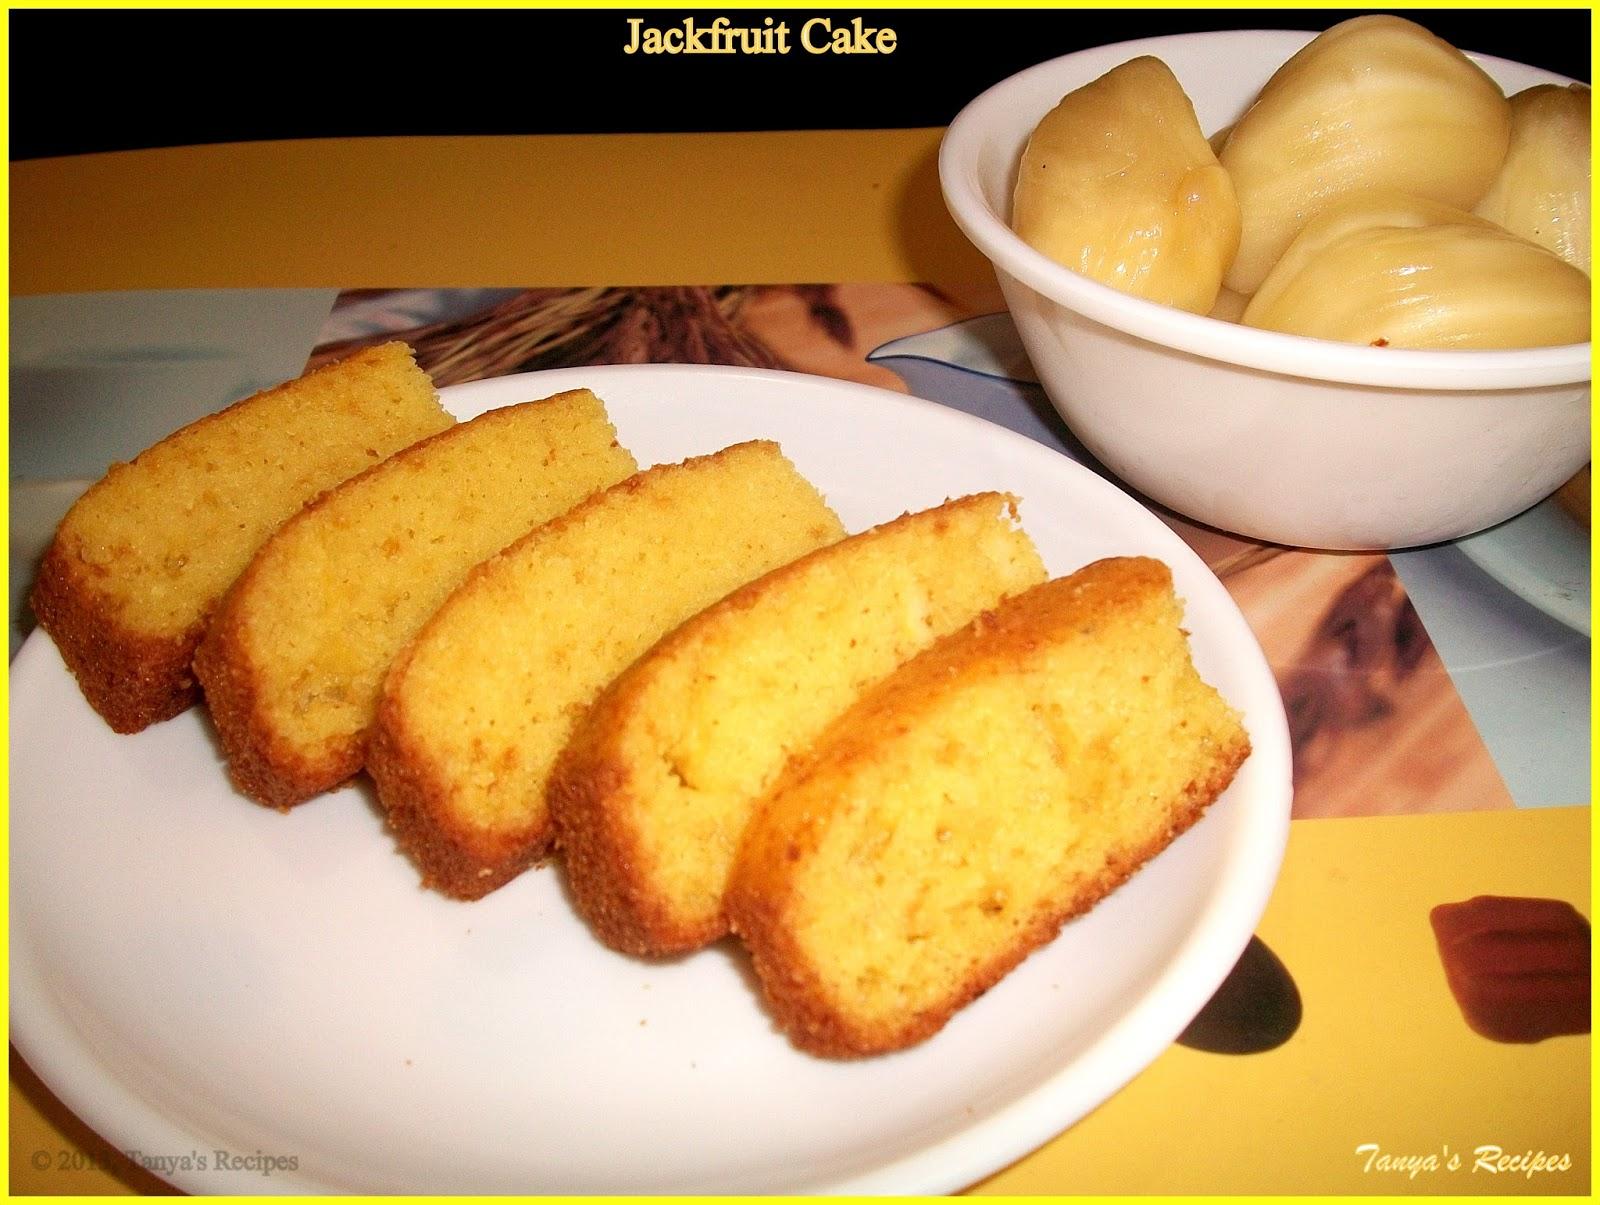 Ripe Jackfruit Cake Recipes